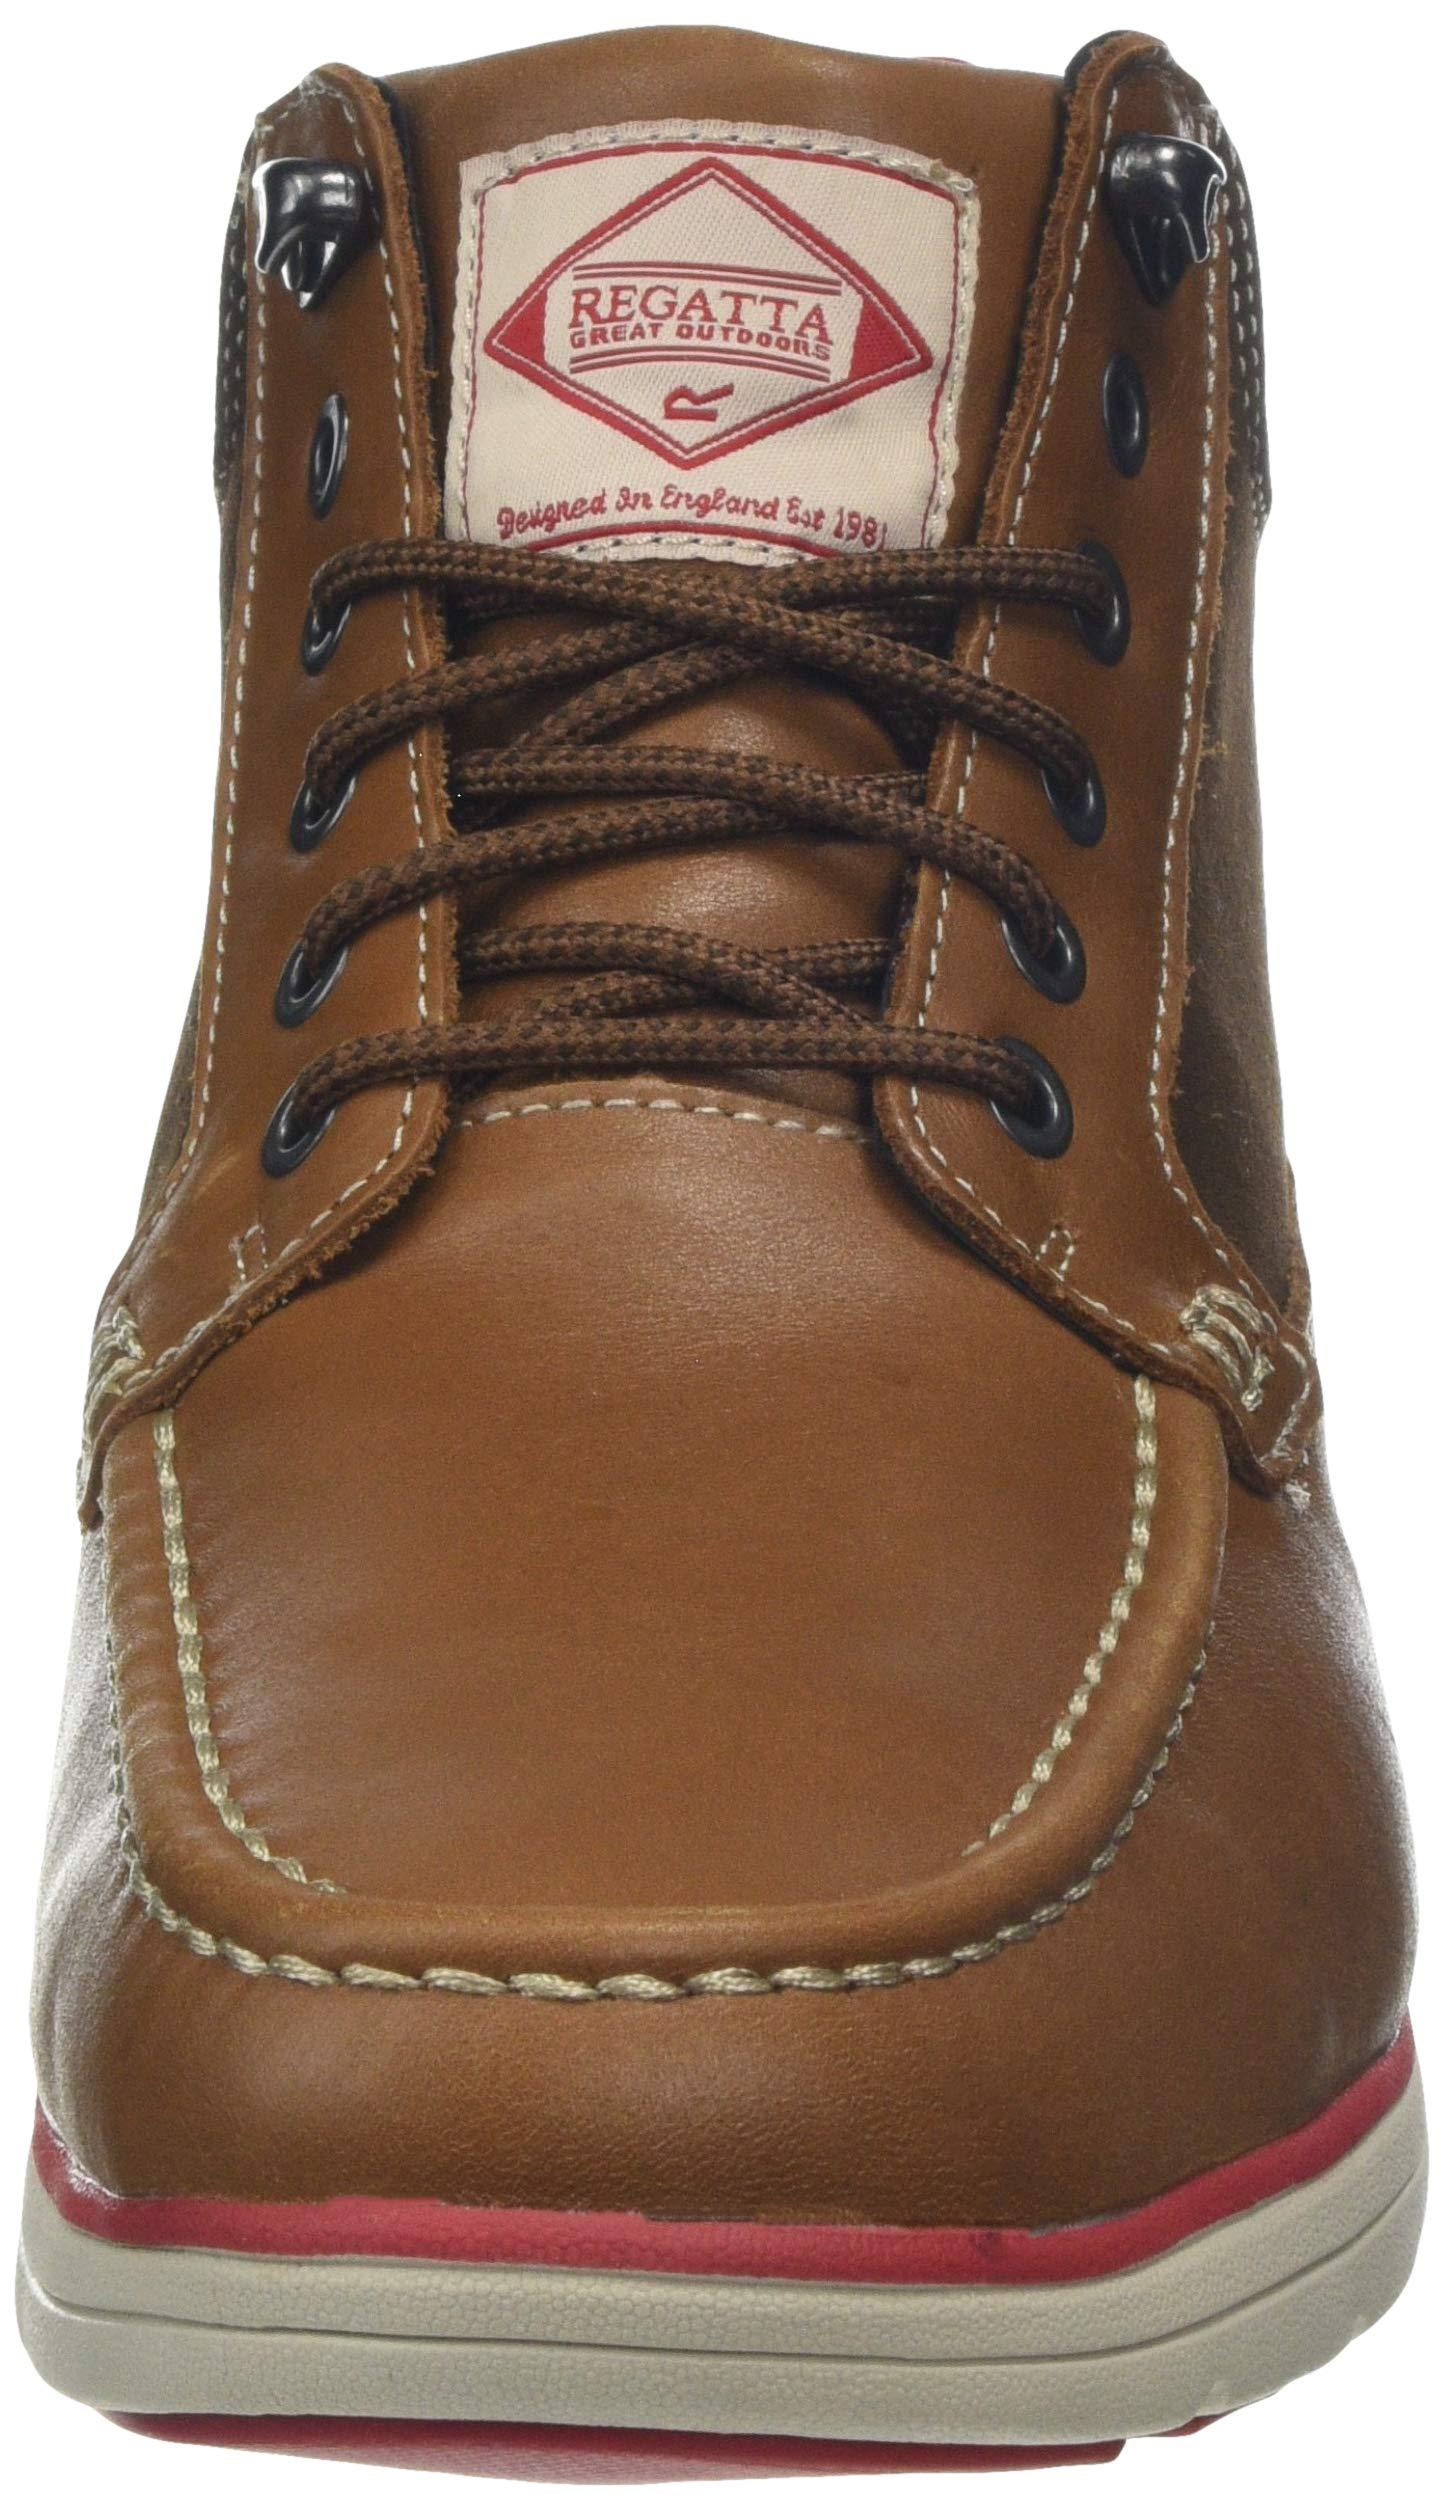 Regatta Denshaw, Men's High Rise Hiking Boots 4